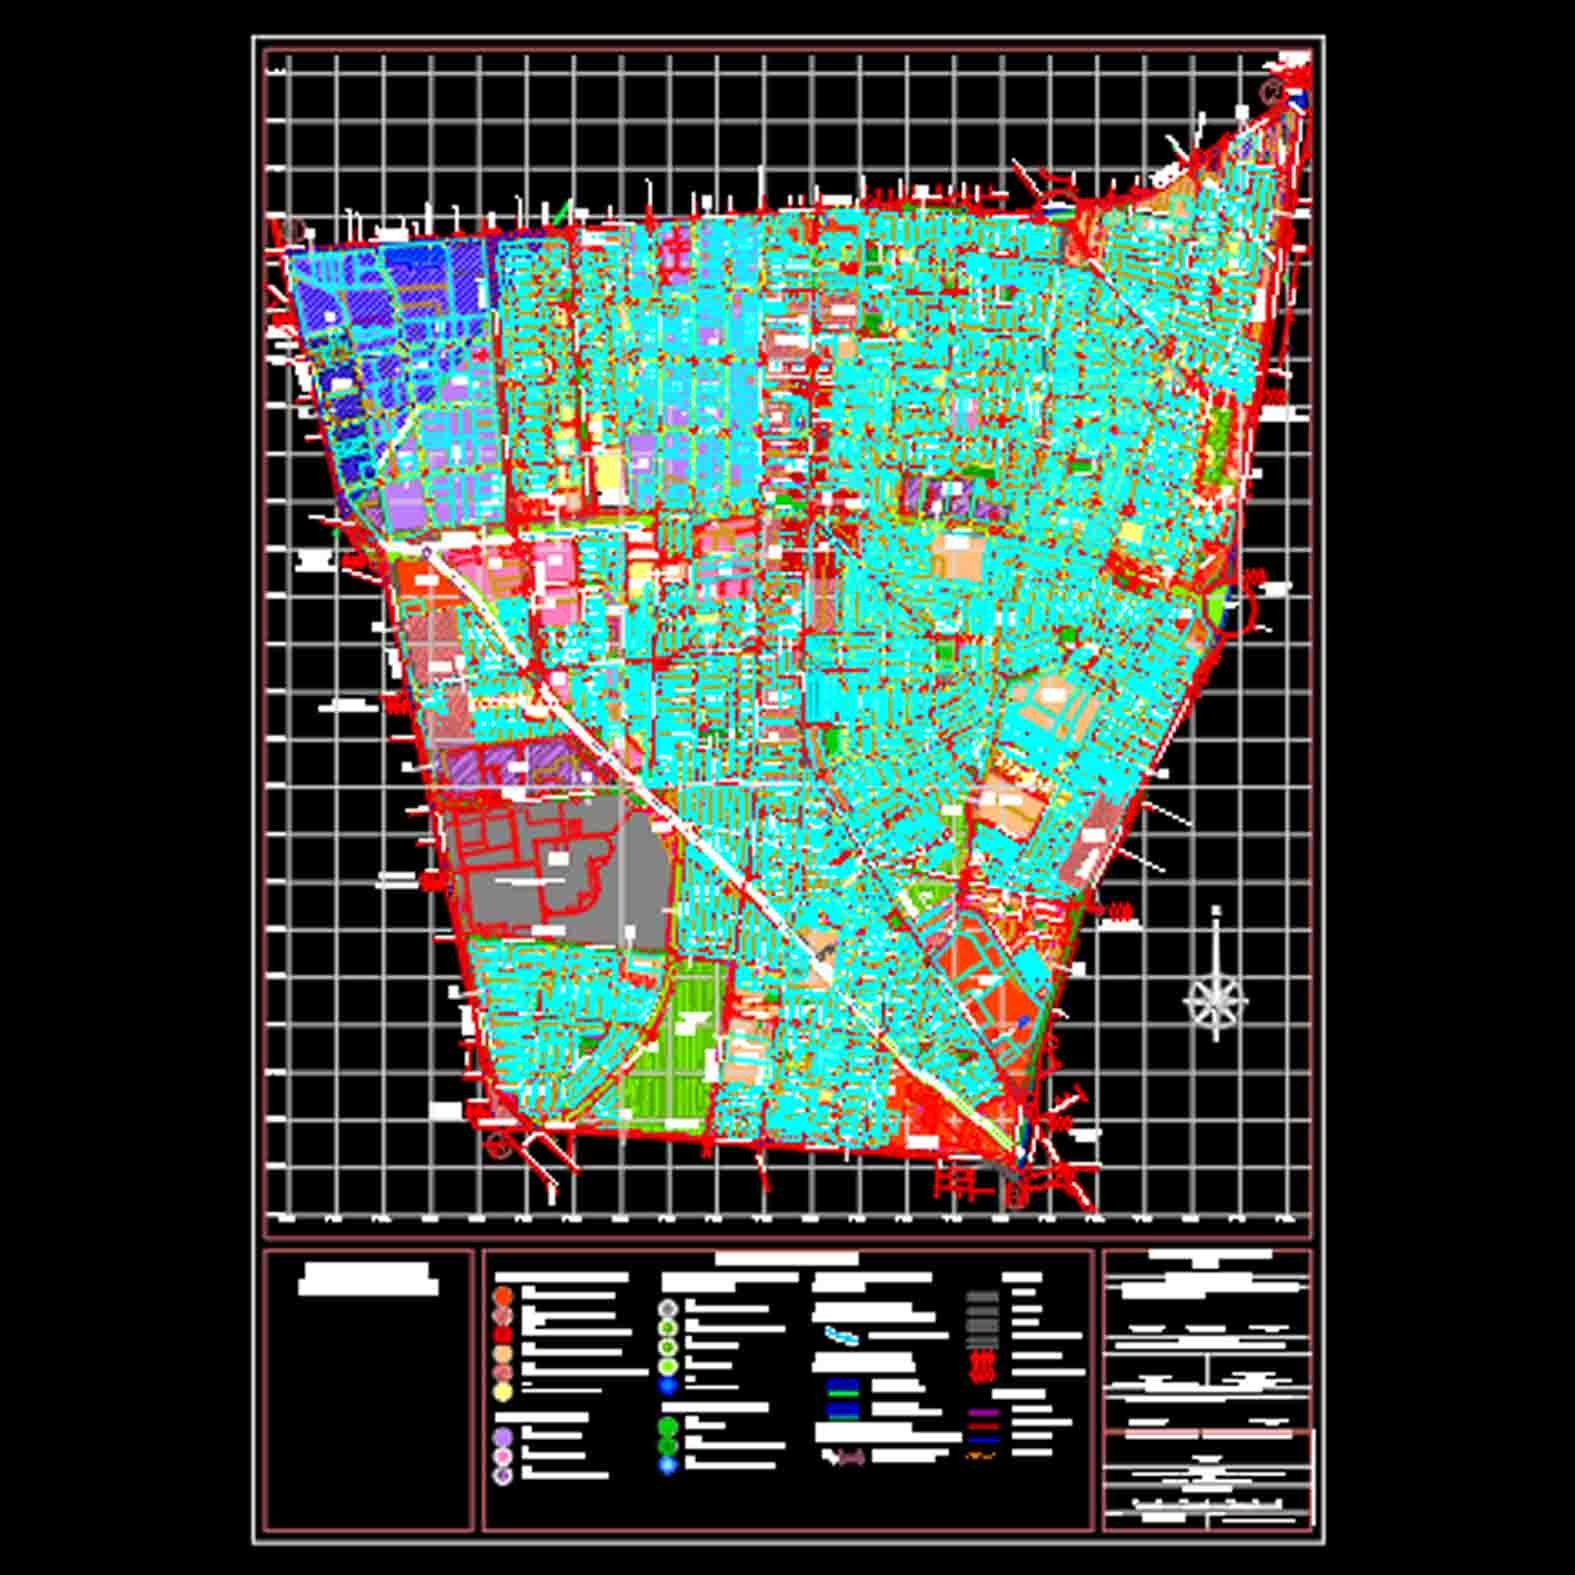 Plano: Comuna de Macul / Plan Regulador